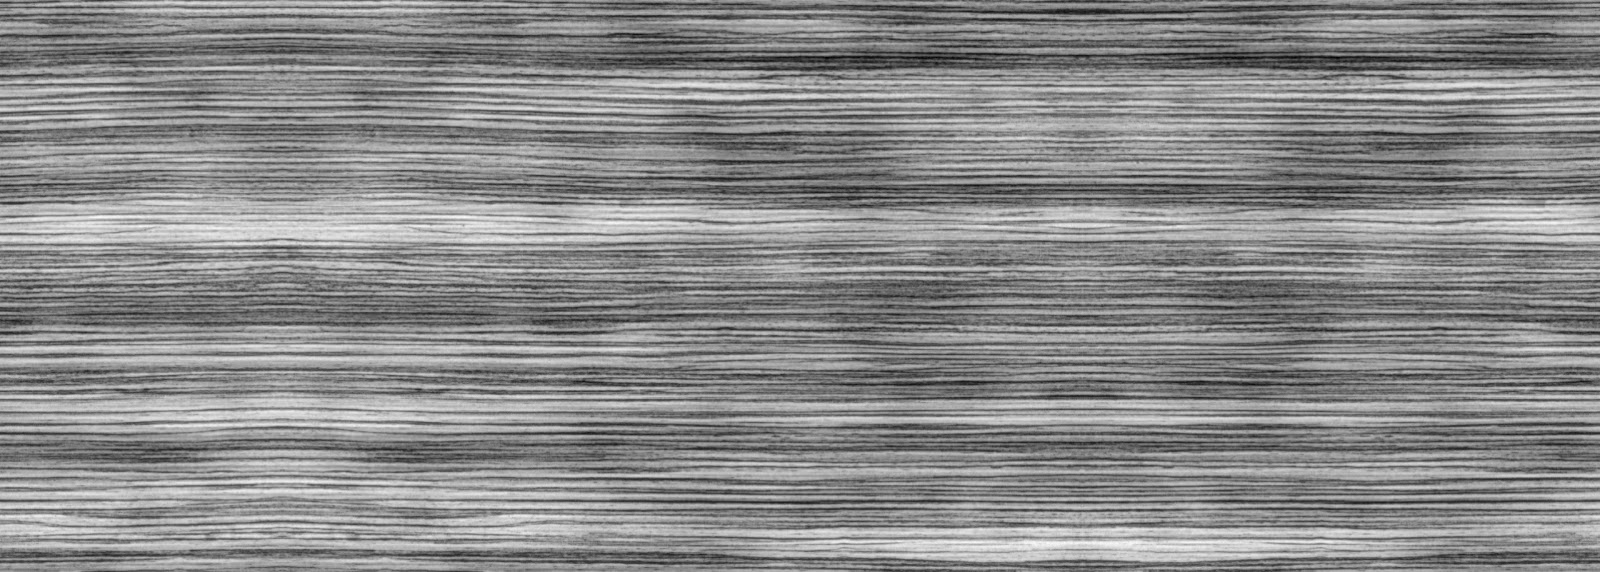 Tileable Fine Wood Zebrano Sand Texture Maps